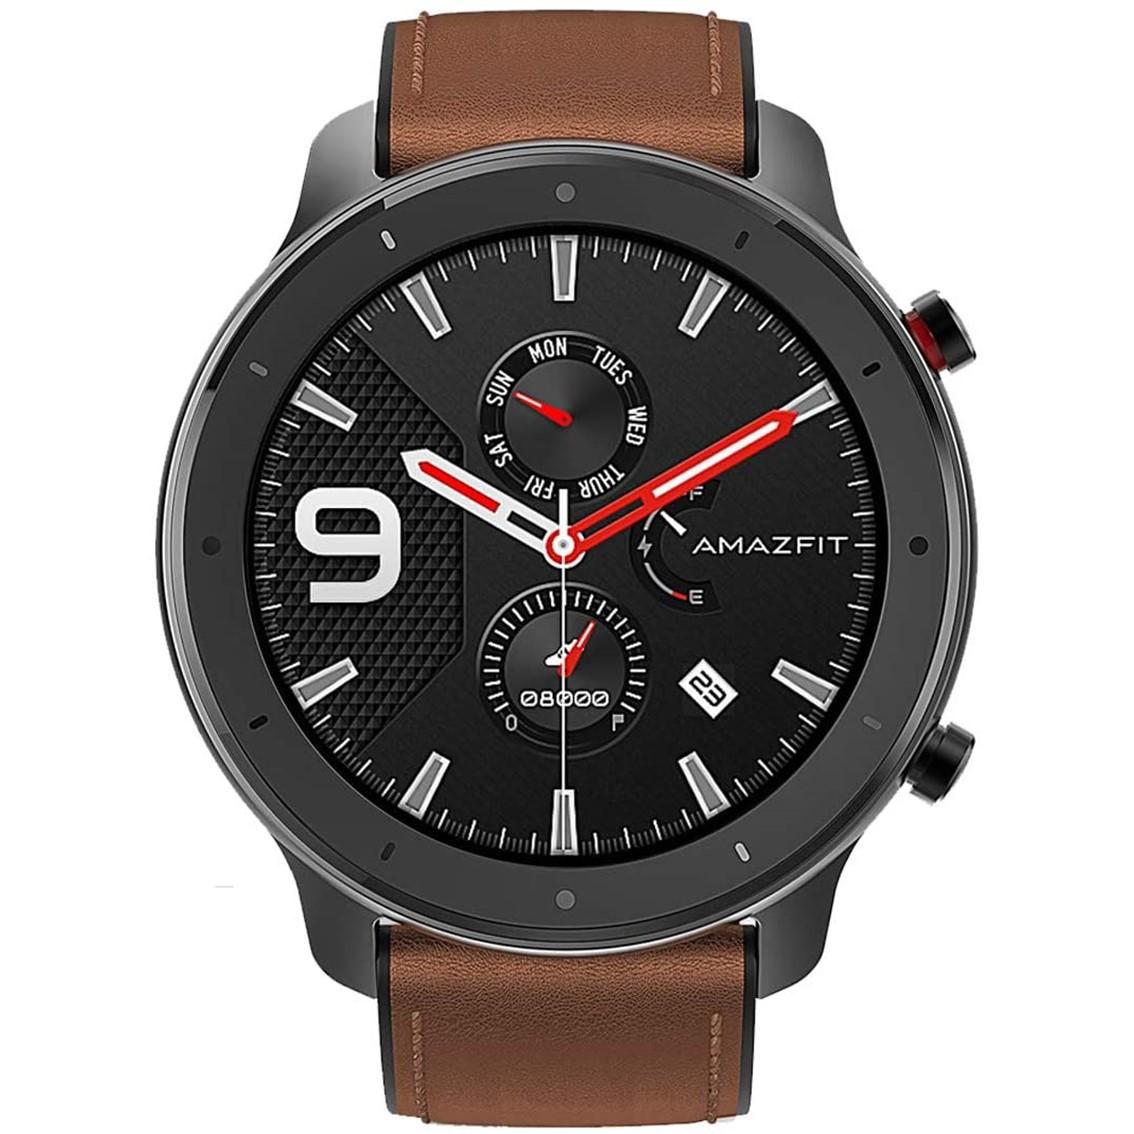 Pulsera reloj deportiva xiaomi amazfit gtr - 47mm gris oscuro -  smartwatch 1.39pulgadas -  bluetooth